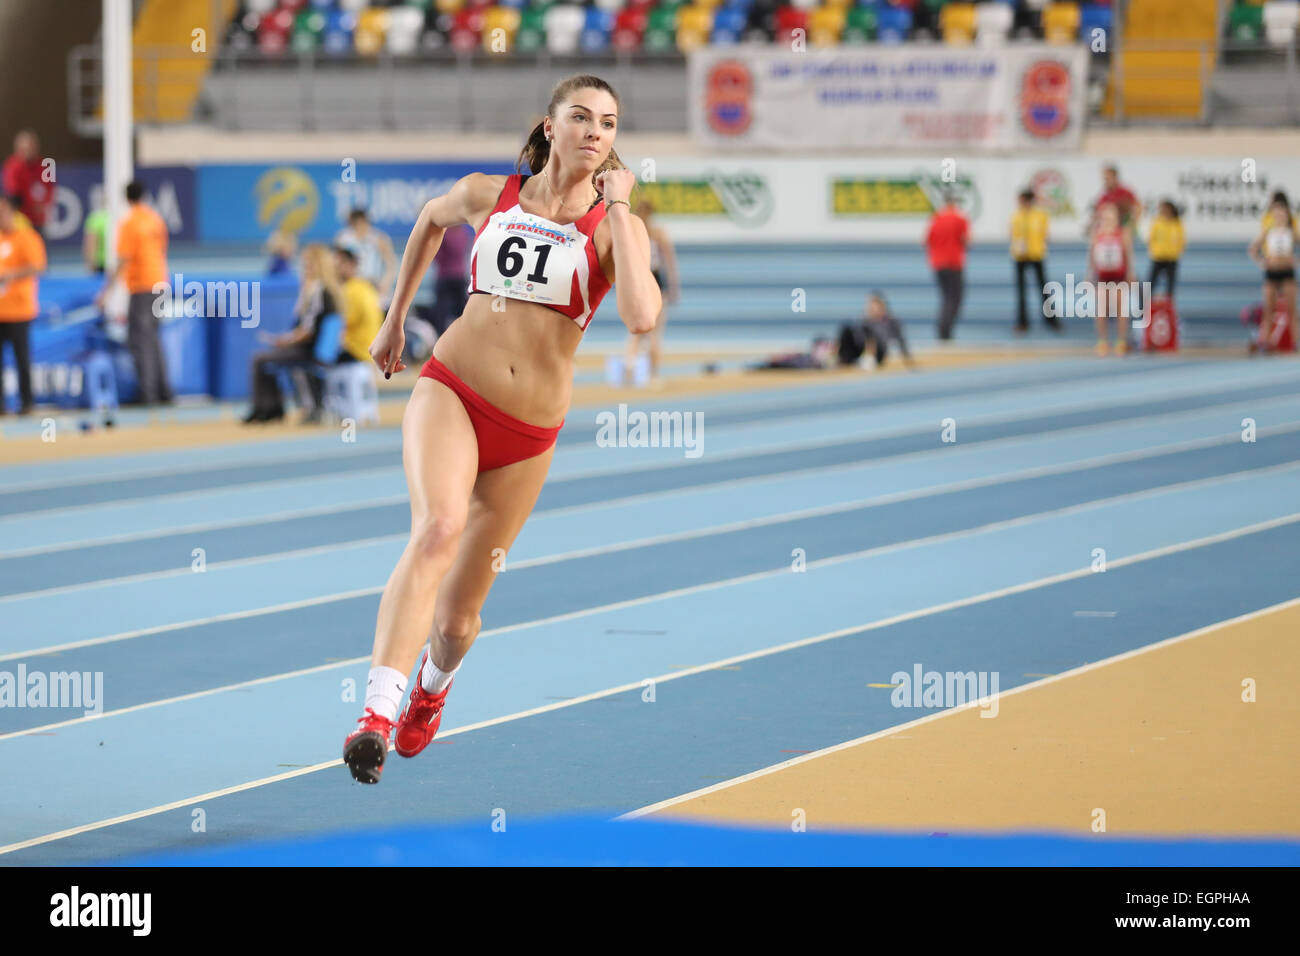 ISTANBUL, TURKEY - FEBRUARY 21, 2015: Montenegrin athlete Marija Vukovic high jump during Balkan Athletics Indoor Stock Photo